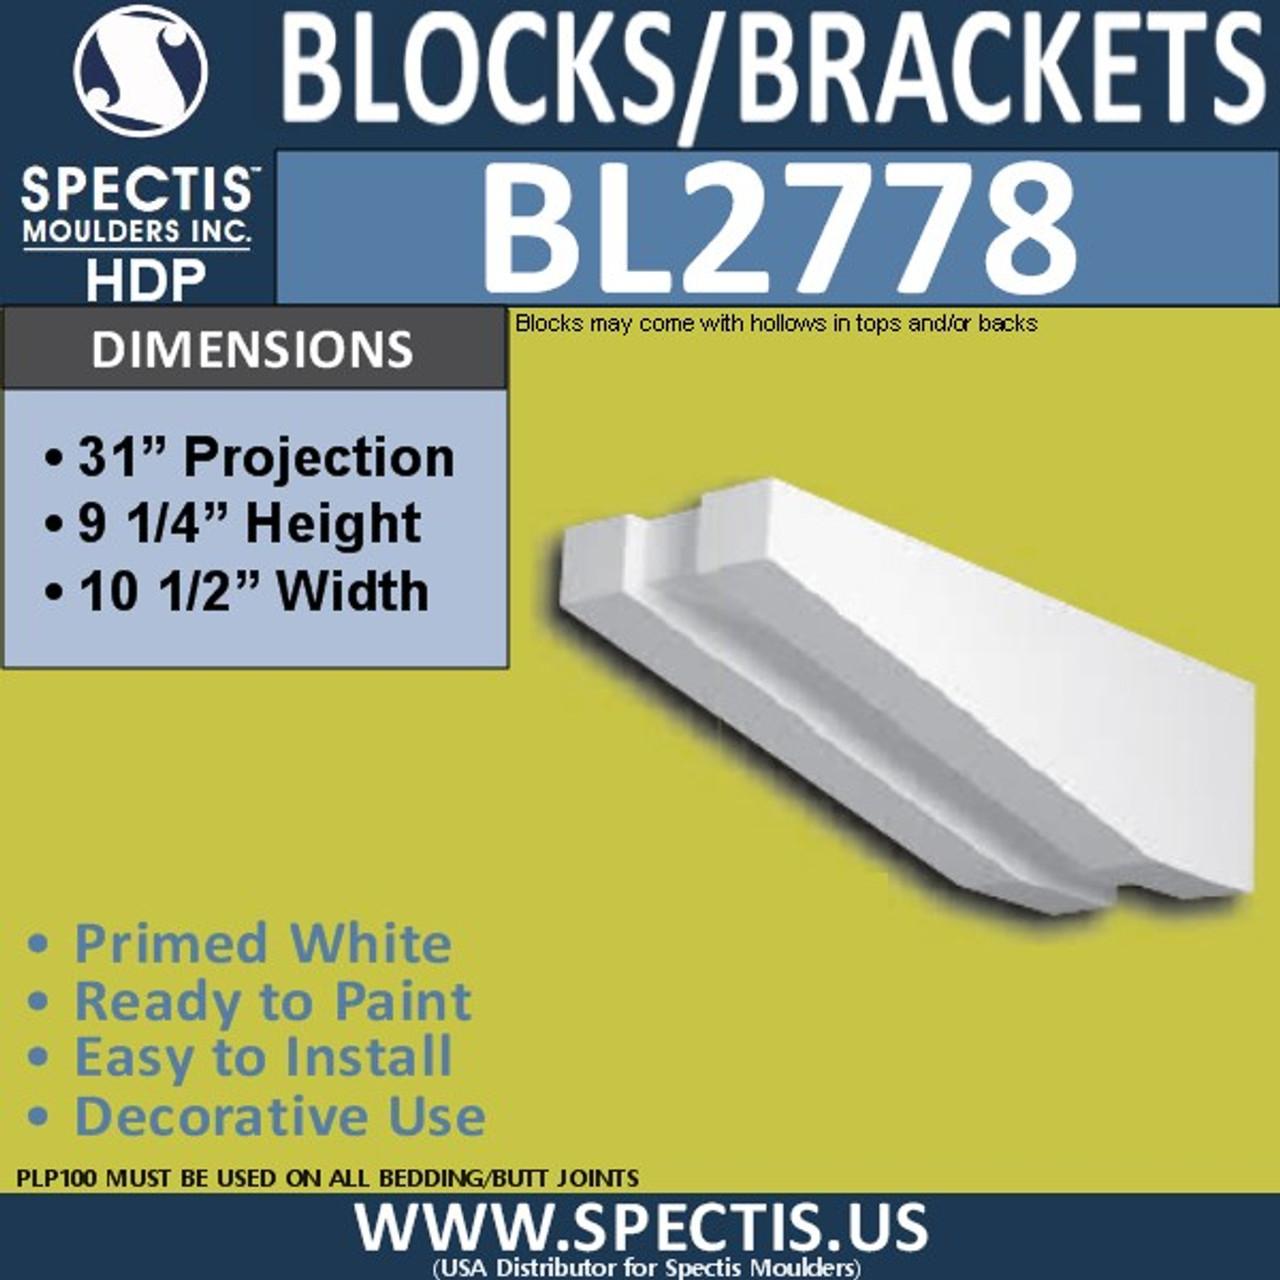 "BL2778 Eave Block or Bracket 10.5""W x 9.25""H x 31"" P"